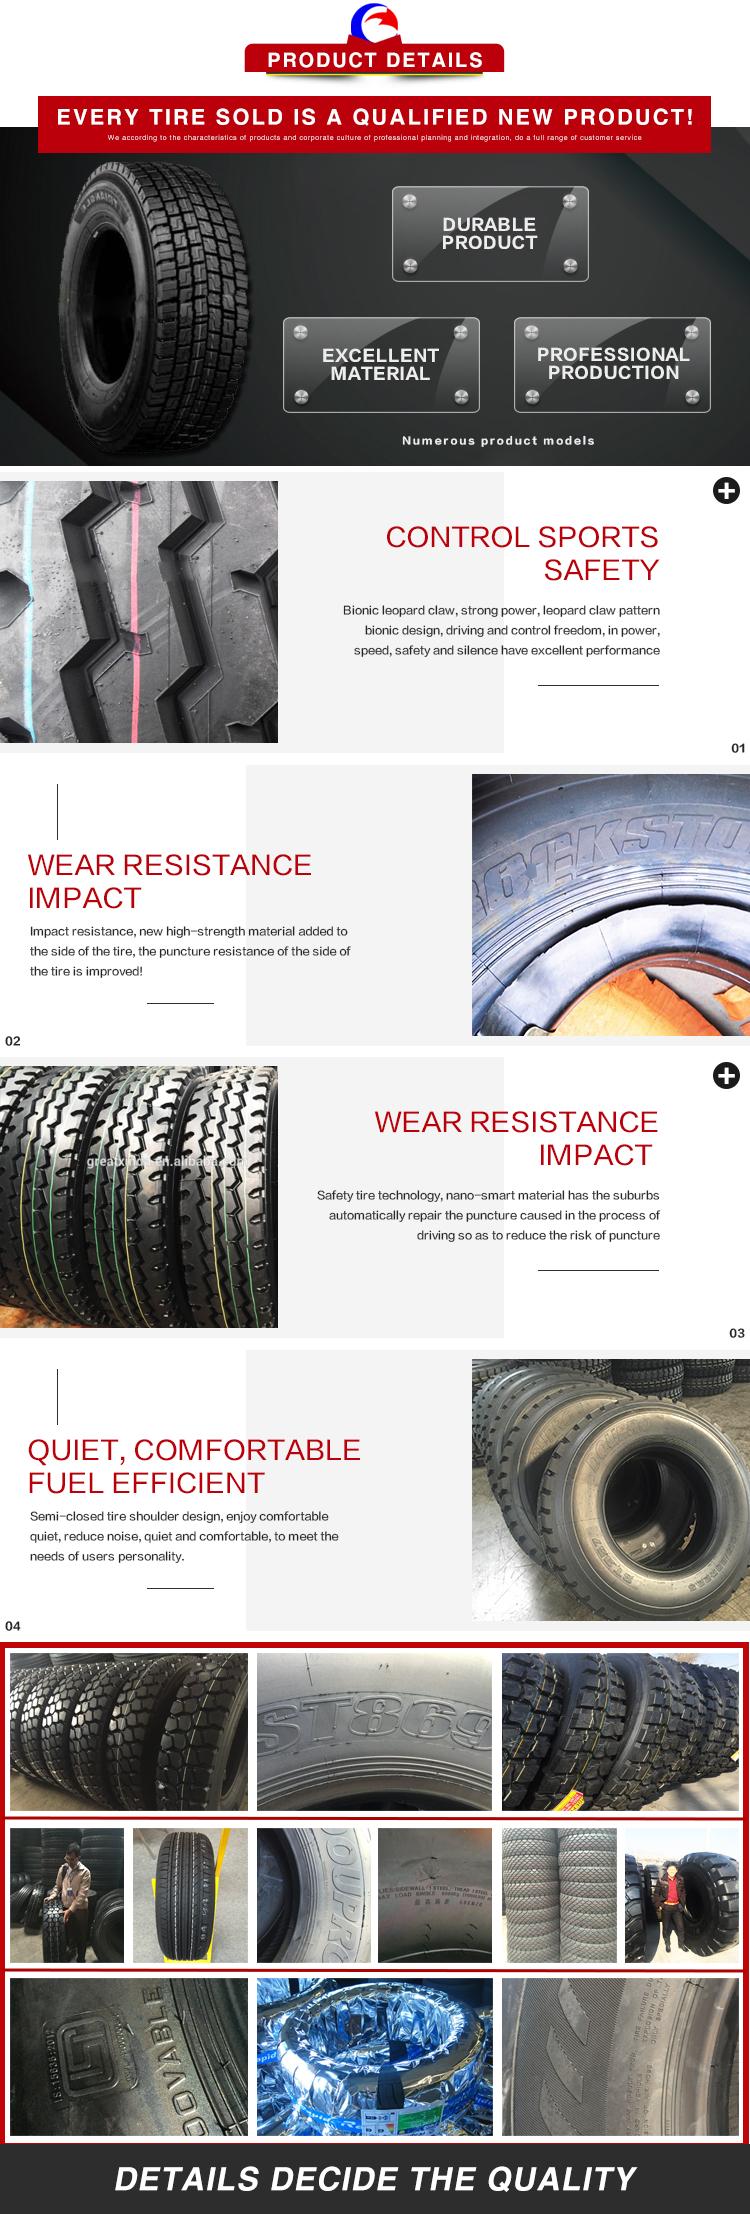 Merk Nieuwe 1000.20 Truck Tyre Factory Directe Verkoop Truck Band Tyer 1100R20 Aelos Made In China